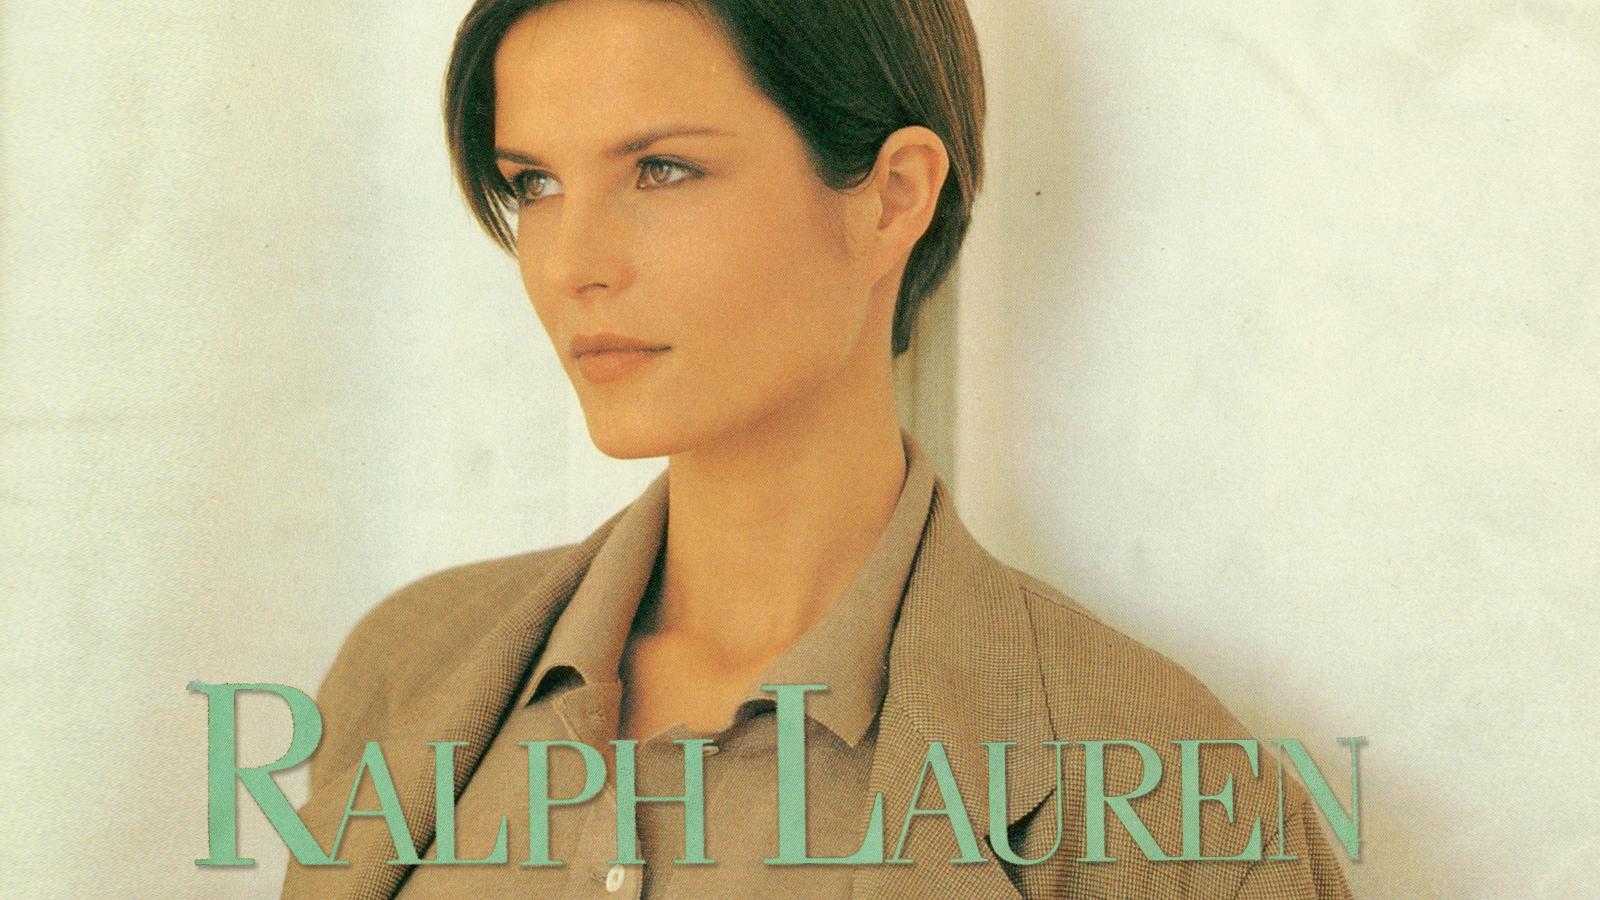 Irene Marie model for Ralph Lauren